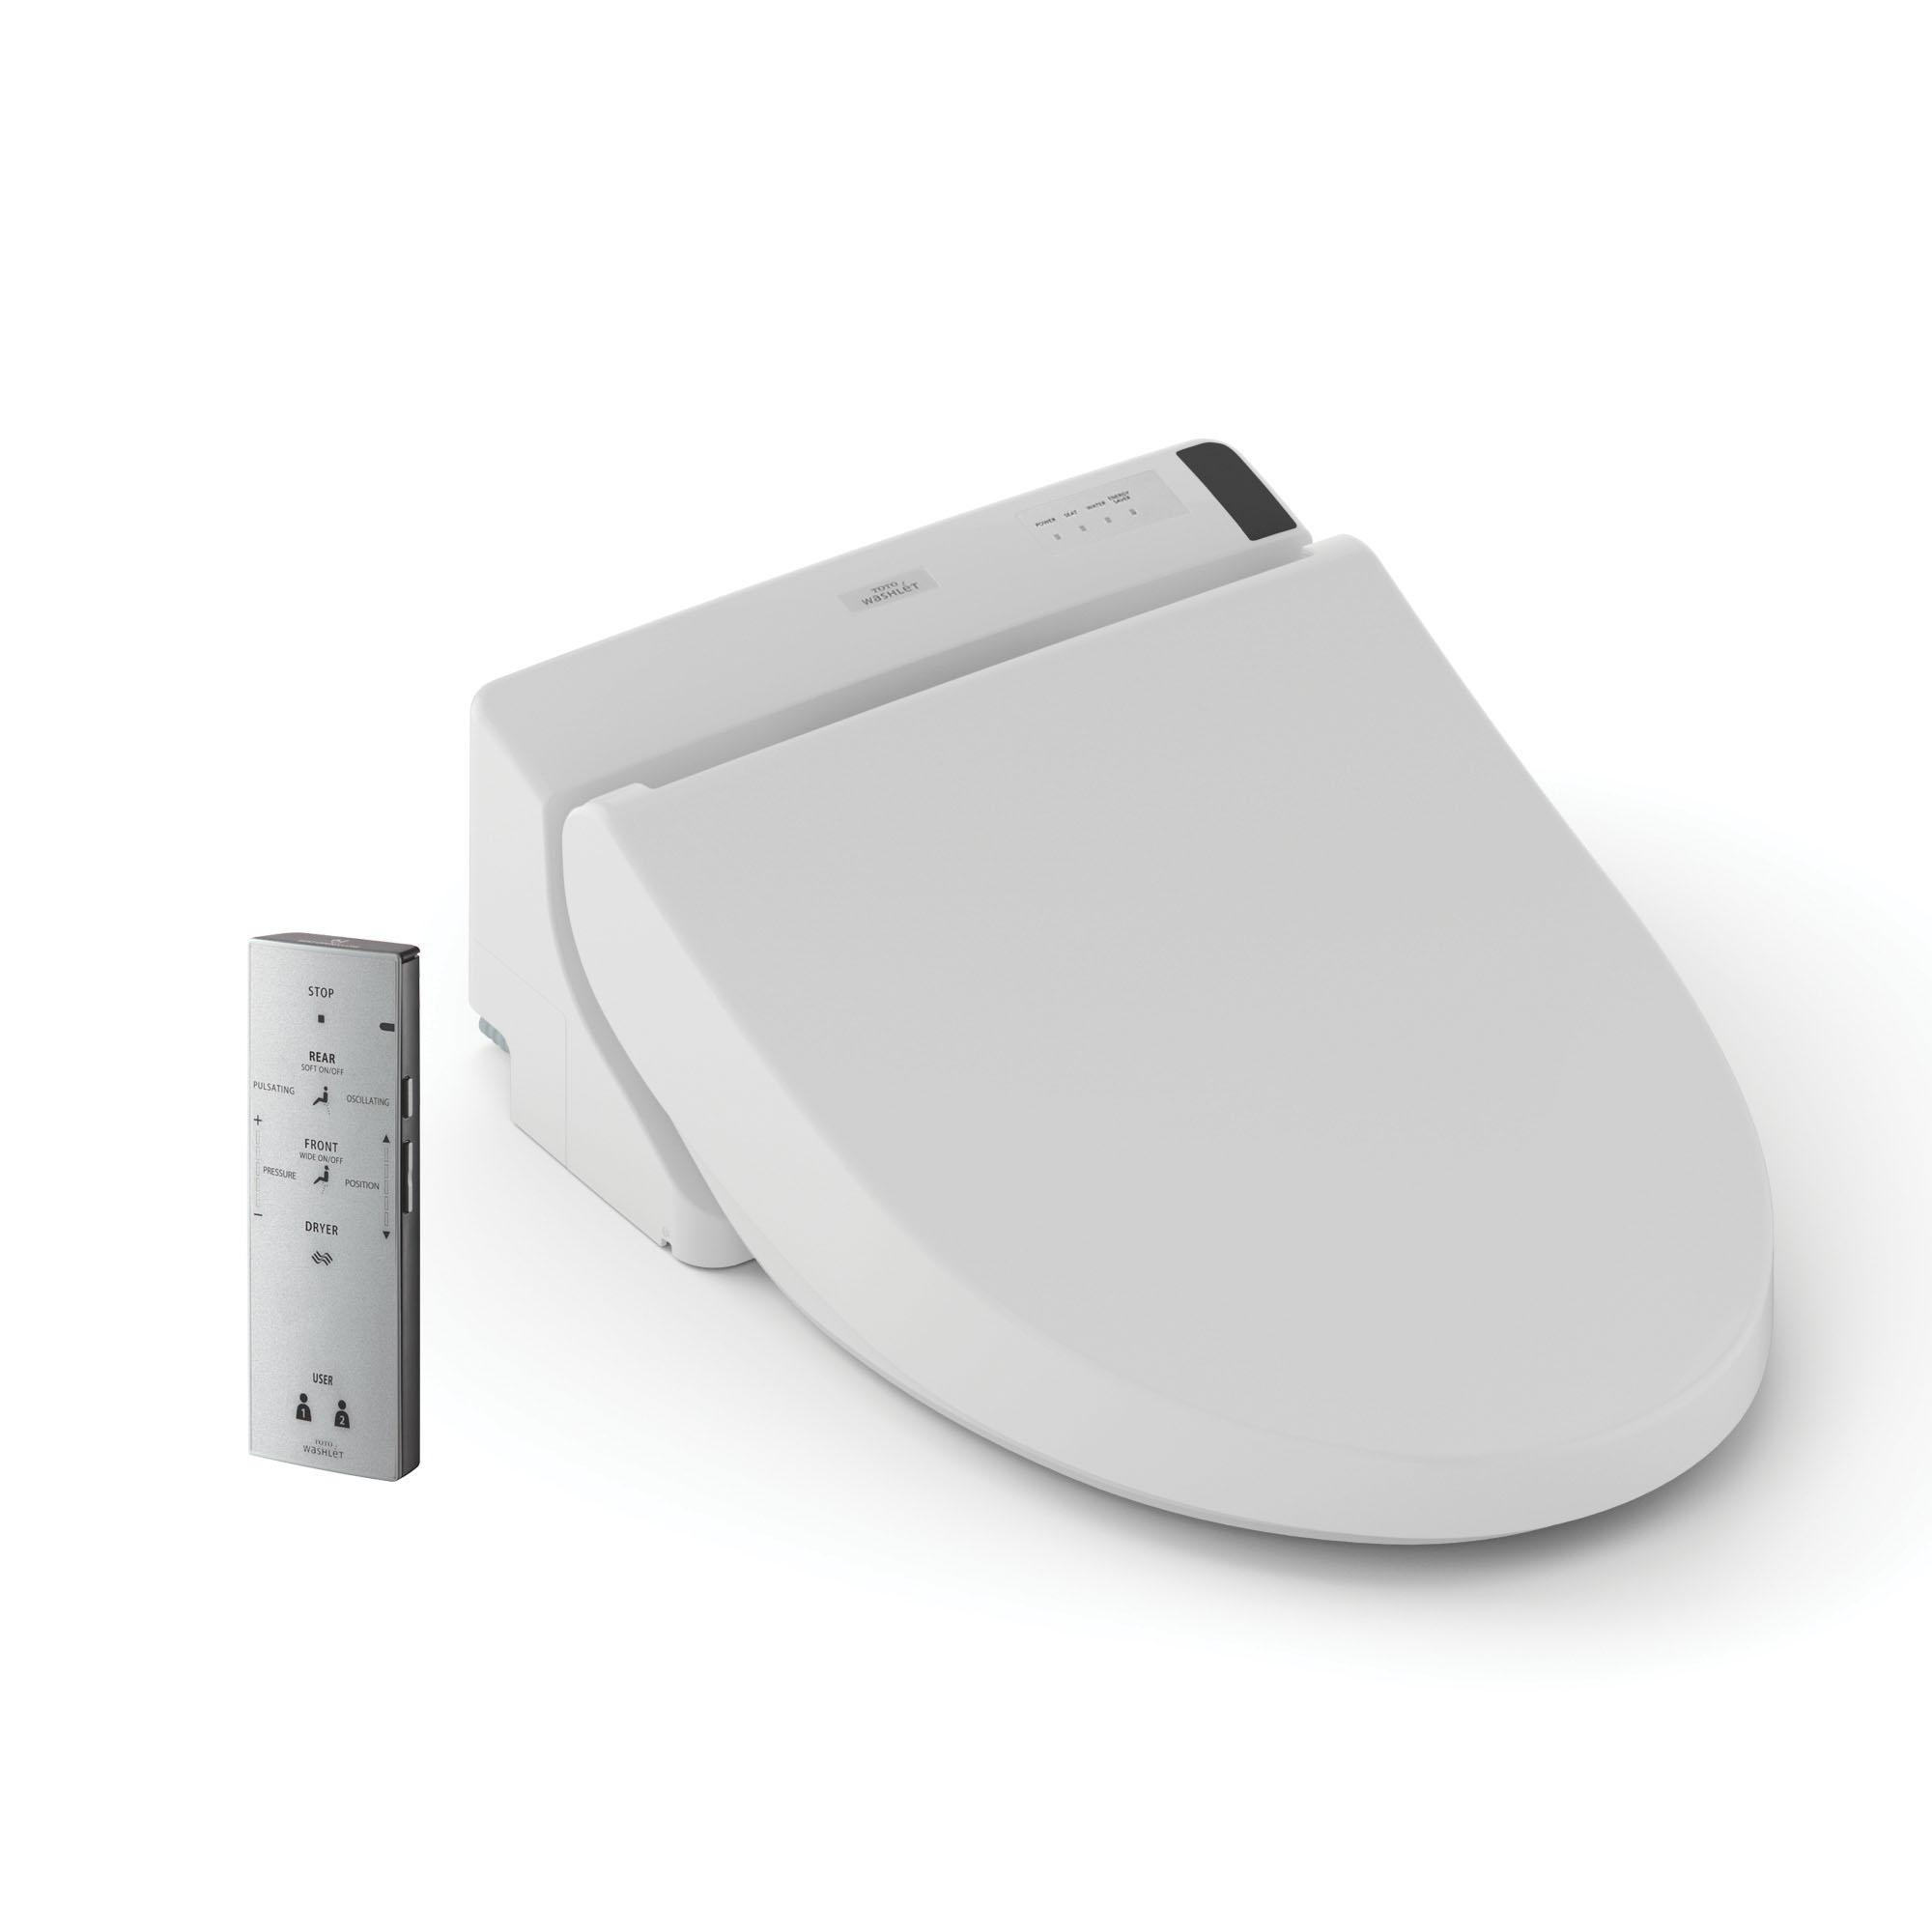 Toto® SW2043R#01 WASHLET® C200 Electronic Bidet Toilet Seat, Round Bowl, Closed Front, Plastic, Cotton White, SoftClose® Hinge, Import